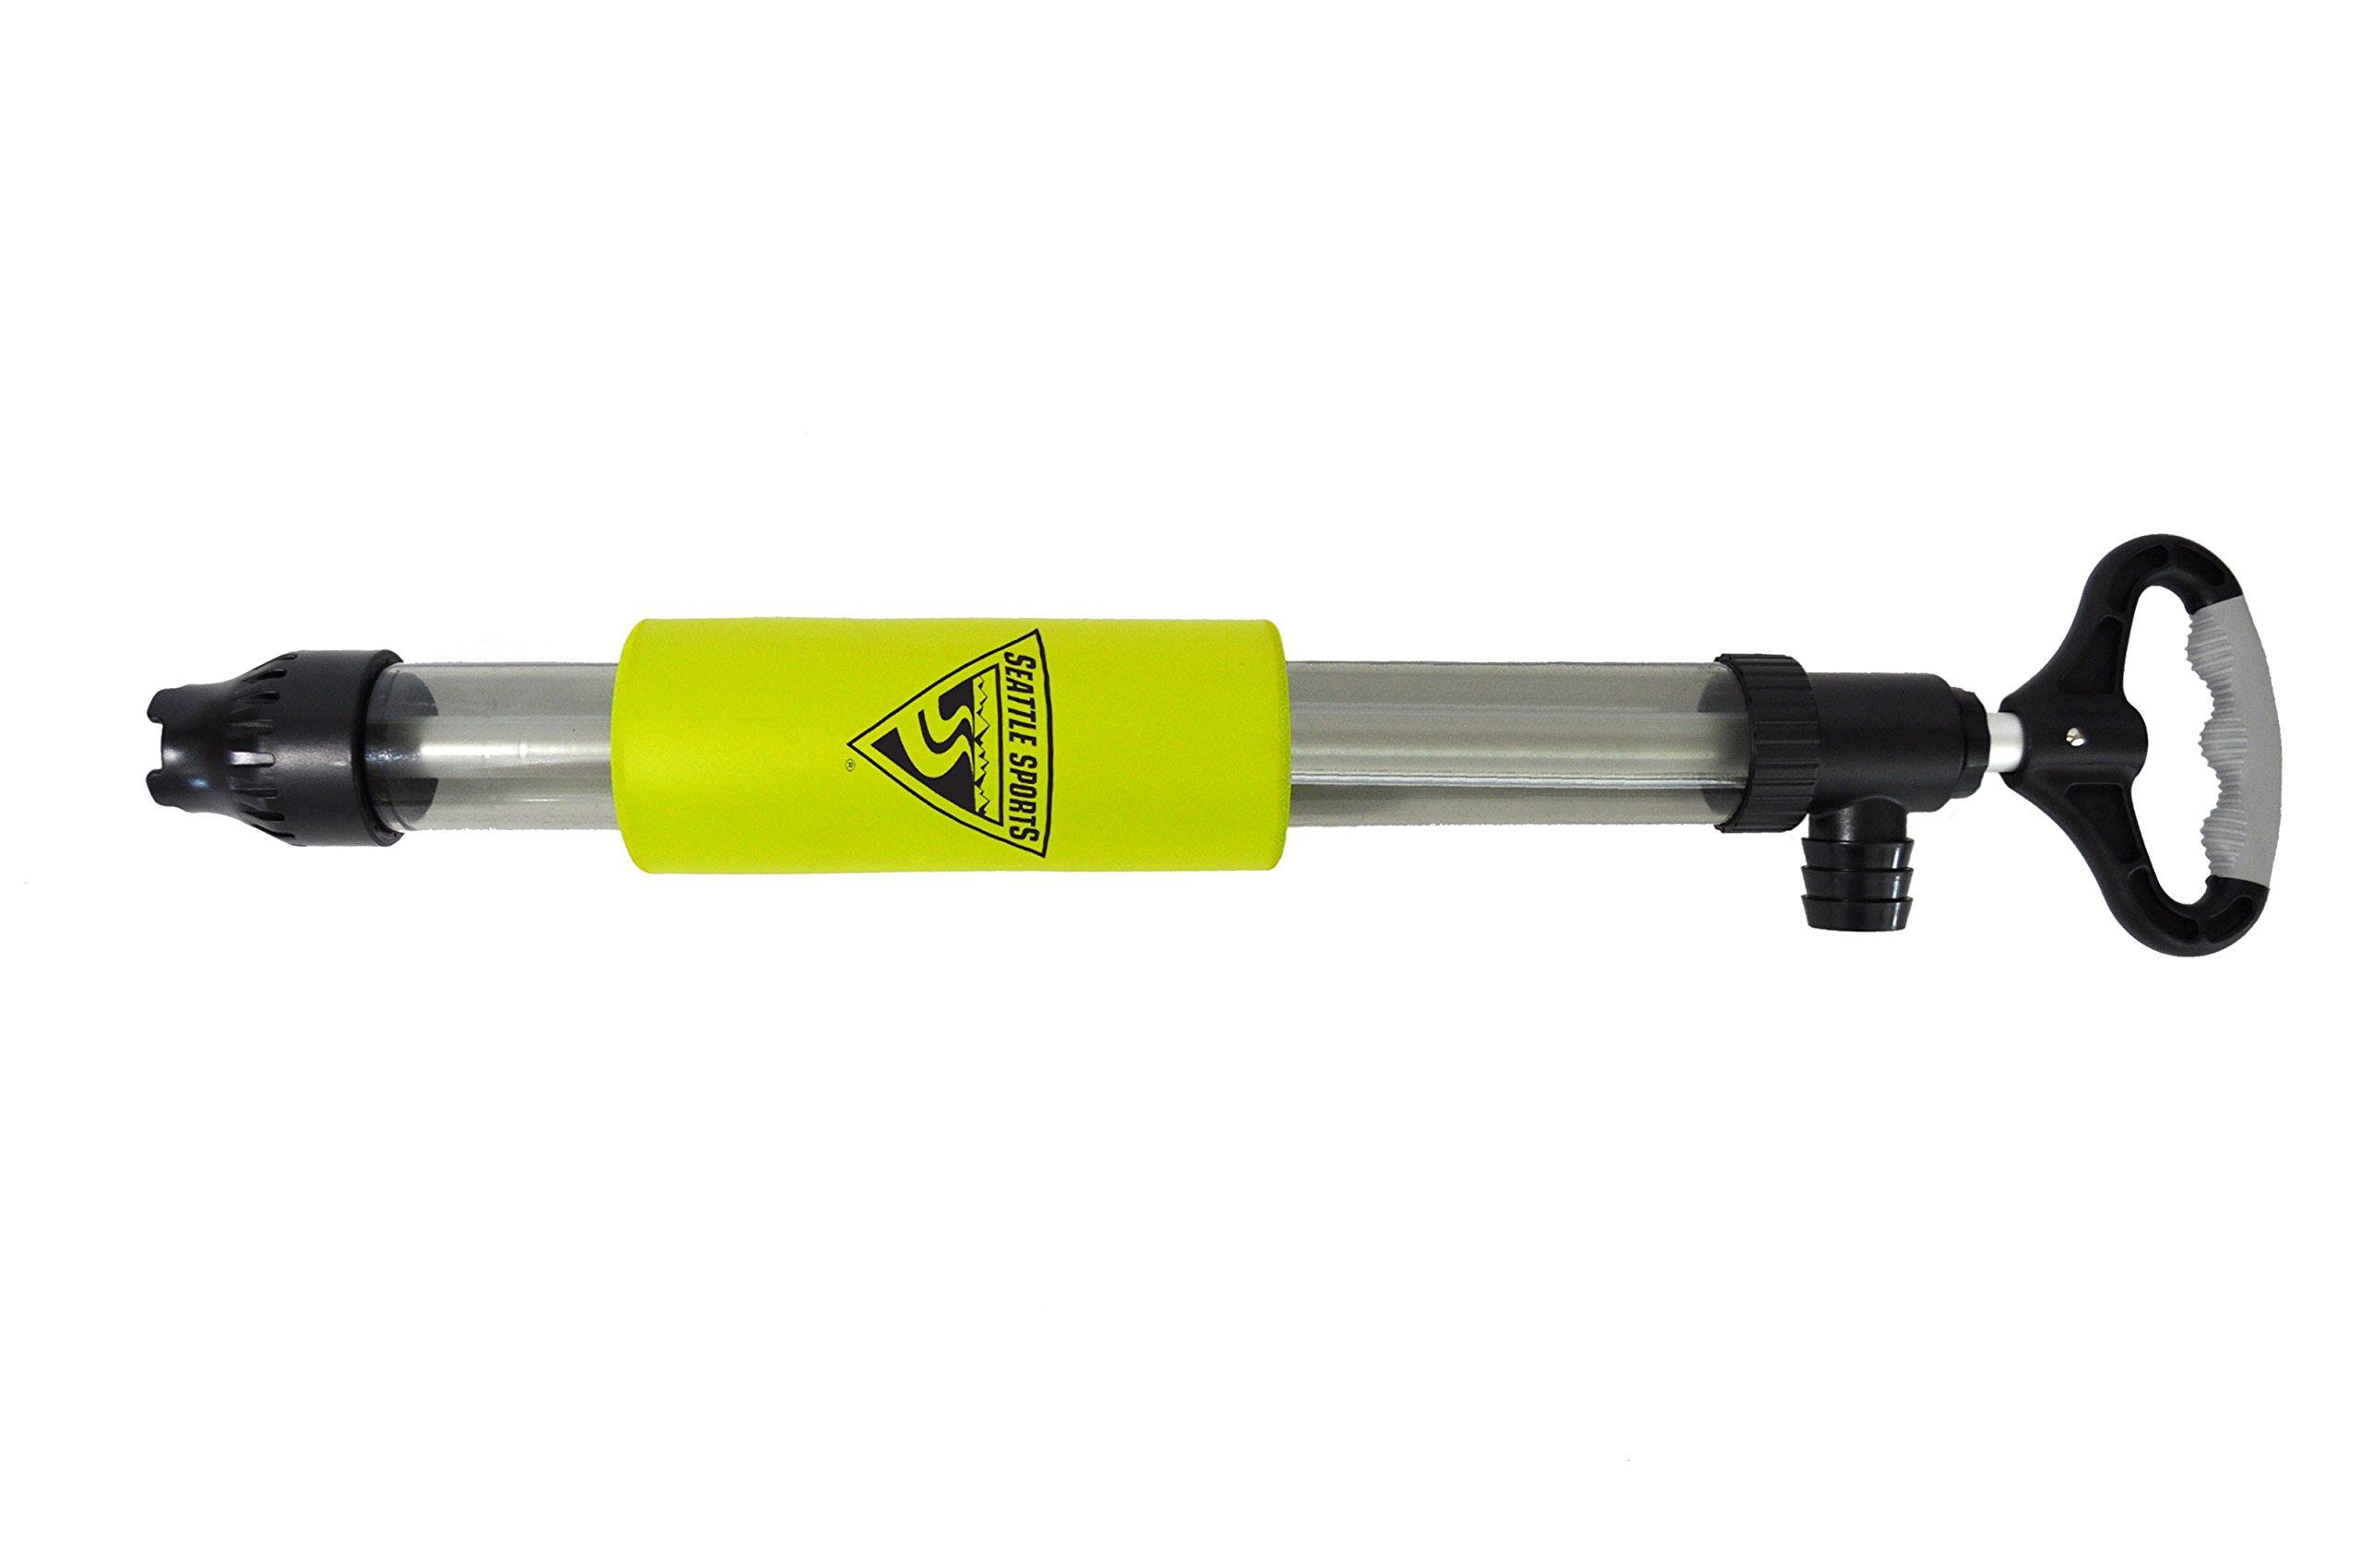 Seattle Sports Breakaway Bilge Pump - Modular Bilge Pump - Easy to Clean - Replaceable Parts - Kayak/Canoe/Boat by Seattle Sports (Image #1)